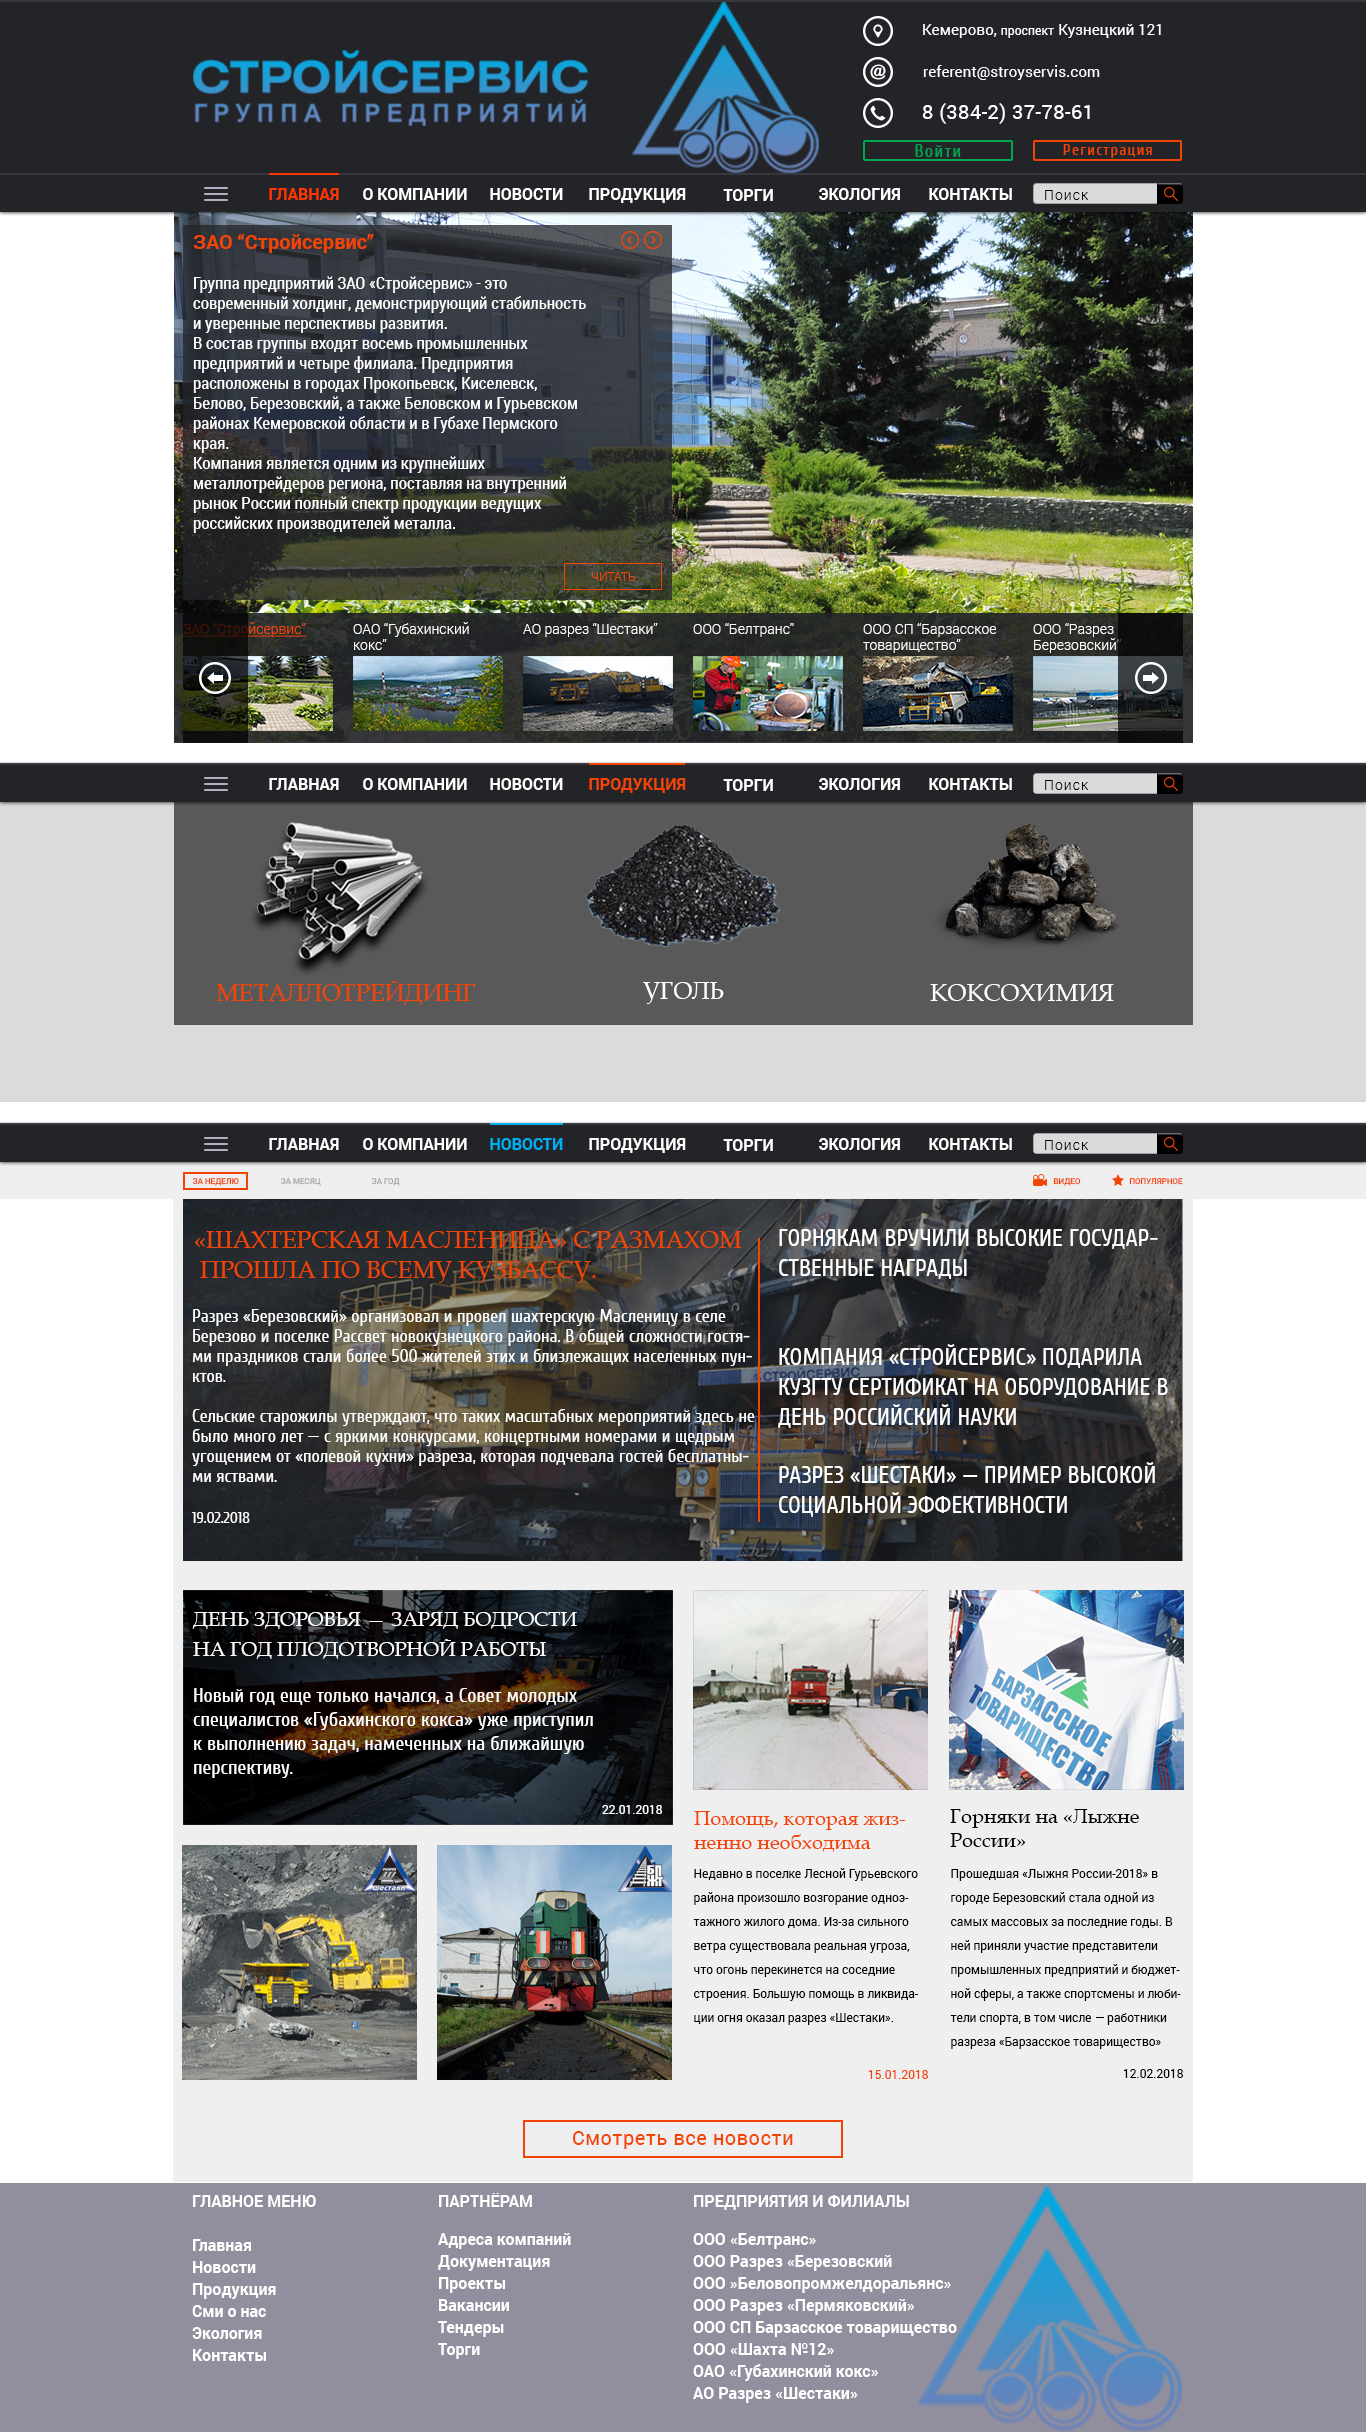 Разработка дизайна сайта угледобывающей компании фото f_3555a912b1274d6f.jpg